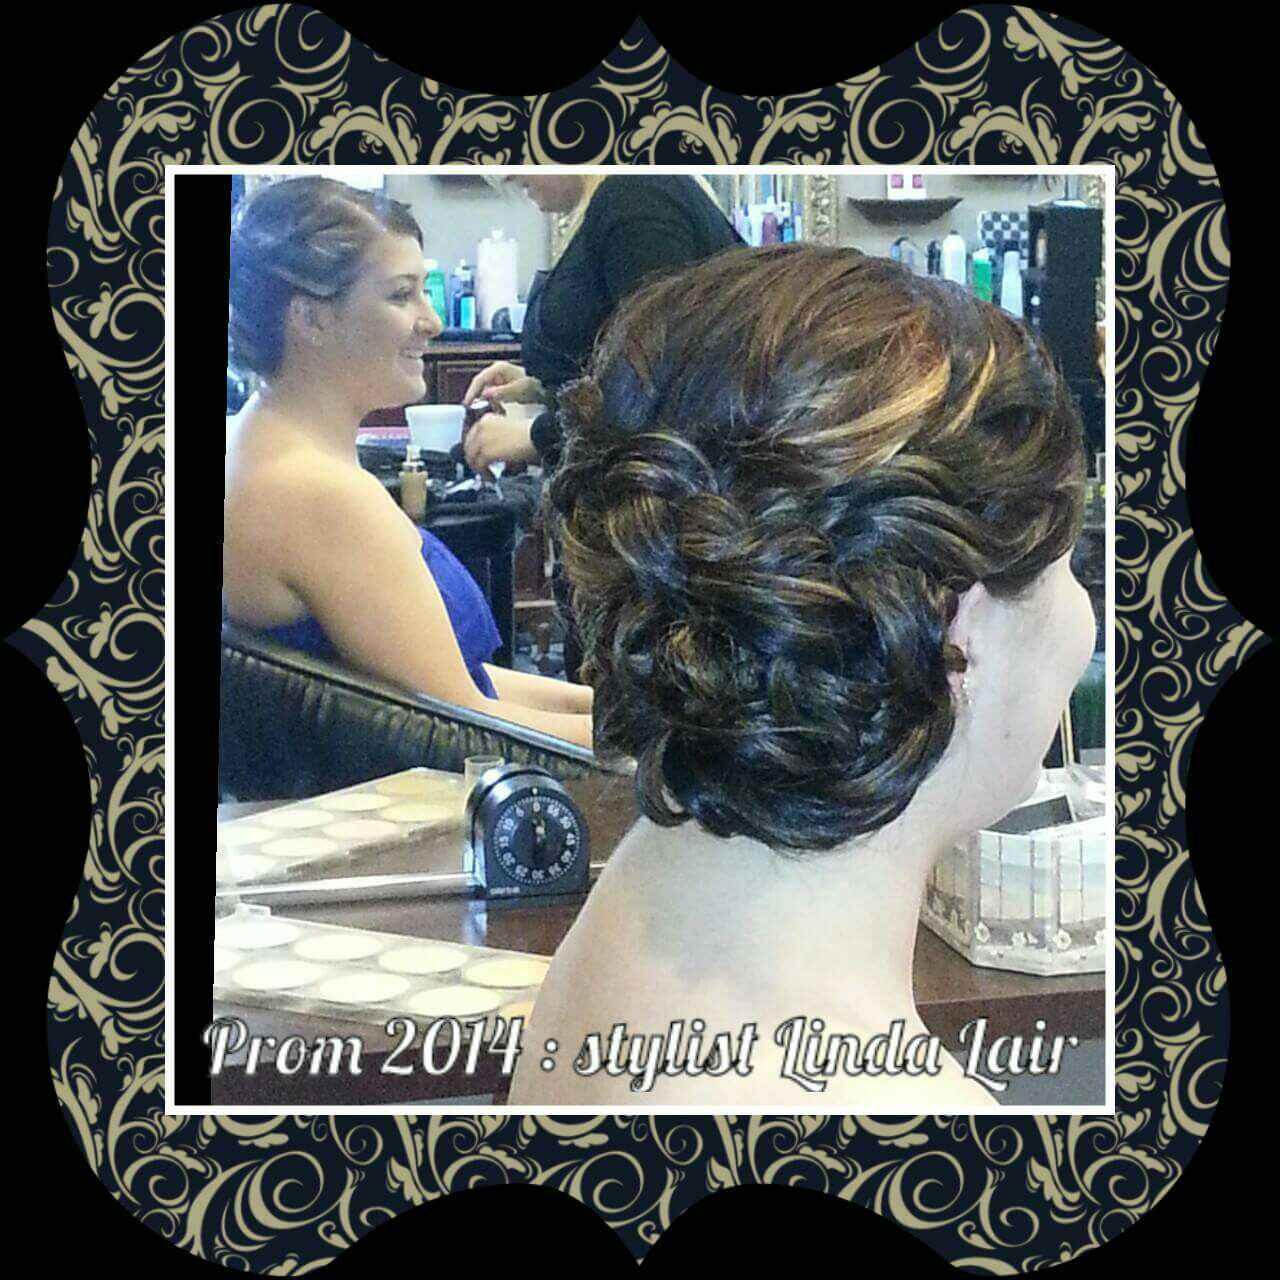 staff2_381978458816.jpg